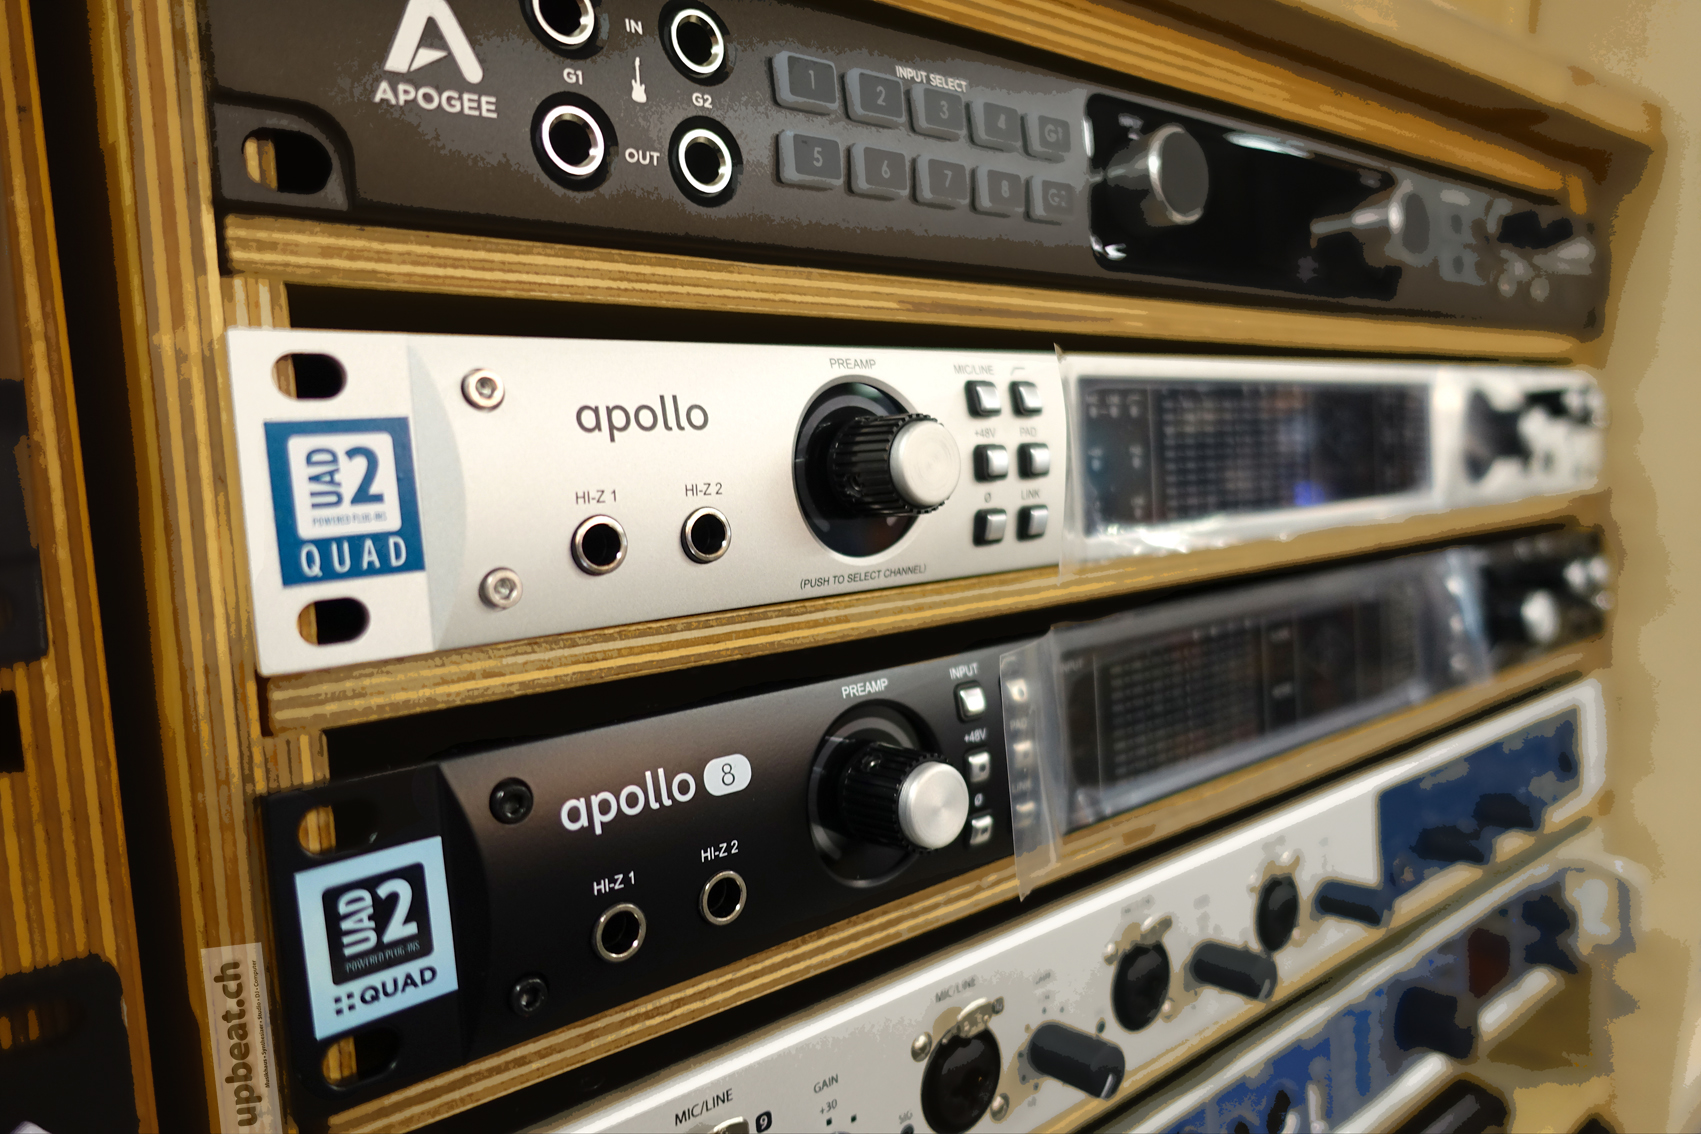 Universal Audio Apollo 8 Quad Thunderbolt2 Aktion Cable Neutrik Xlr 1 4quot Combo Jacks And Phantom Power Sound Design